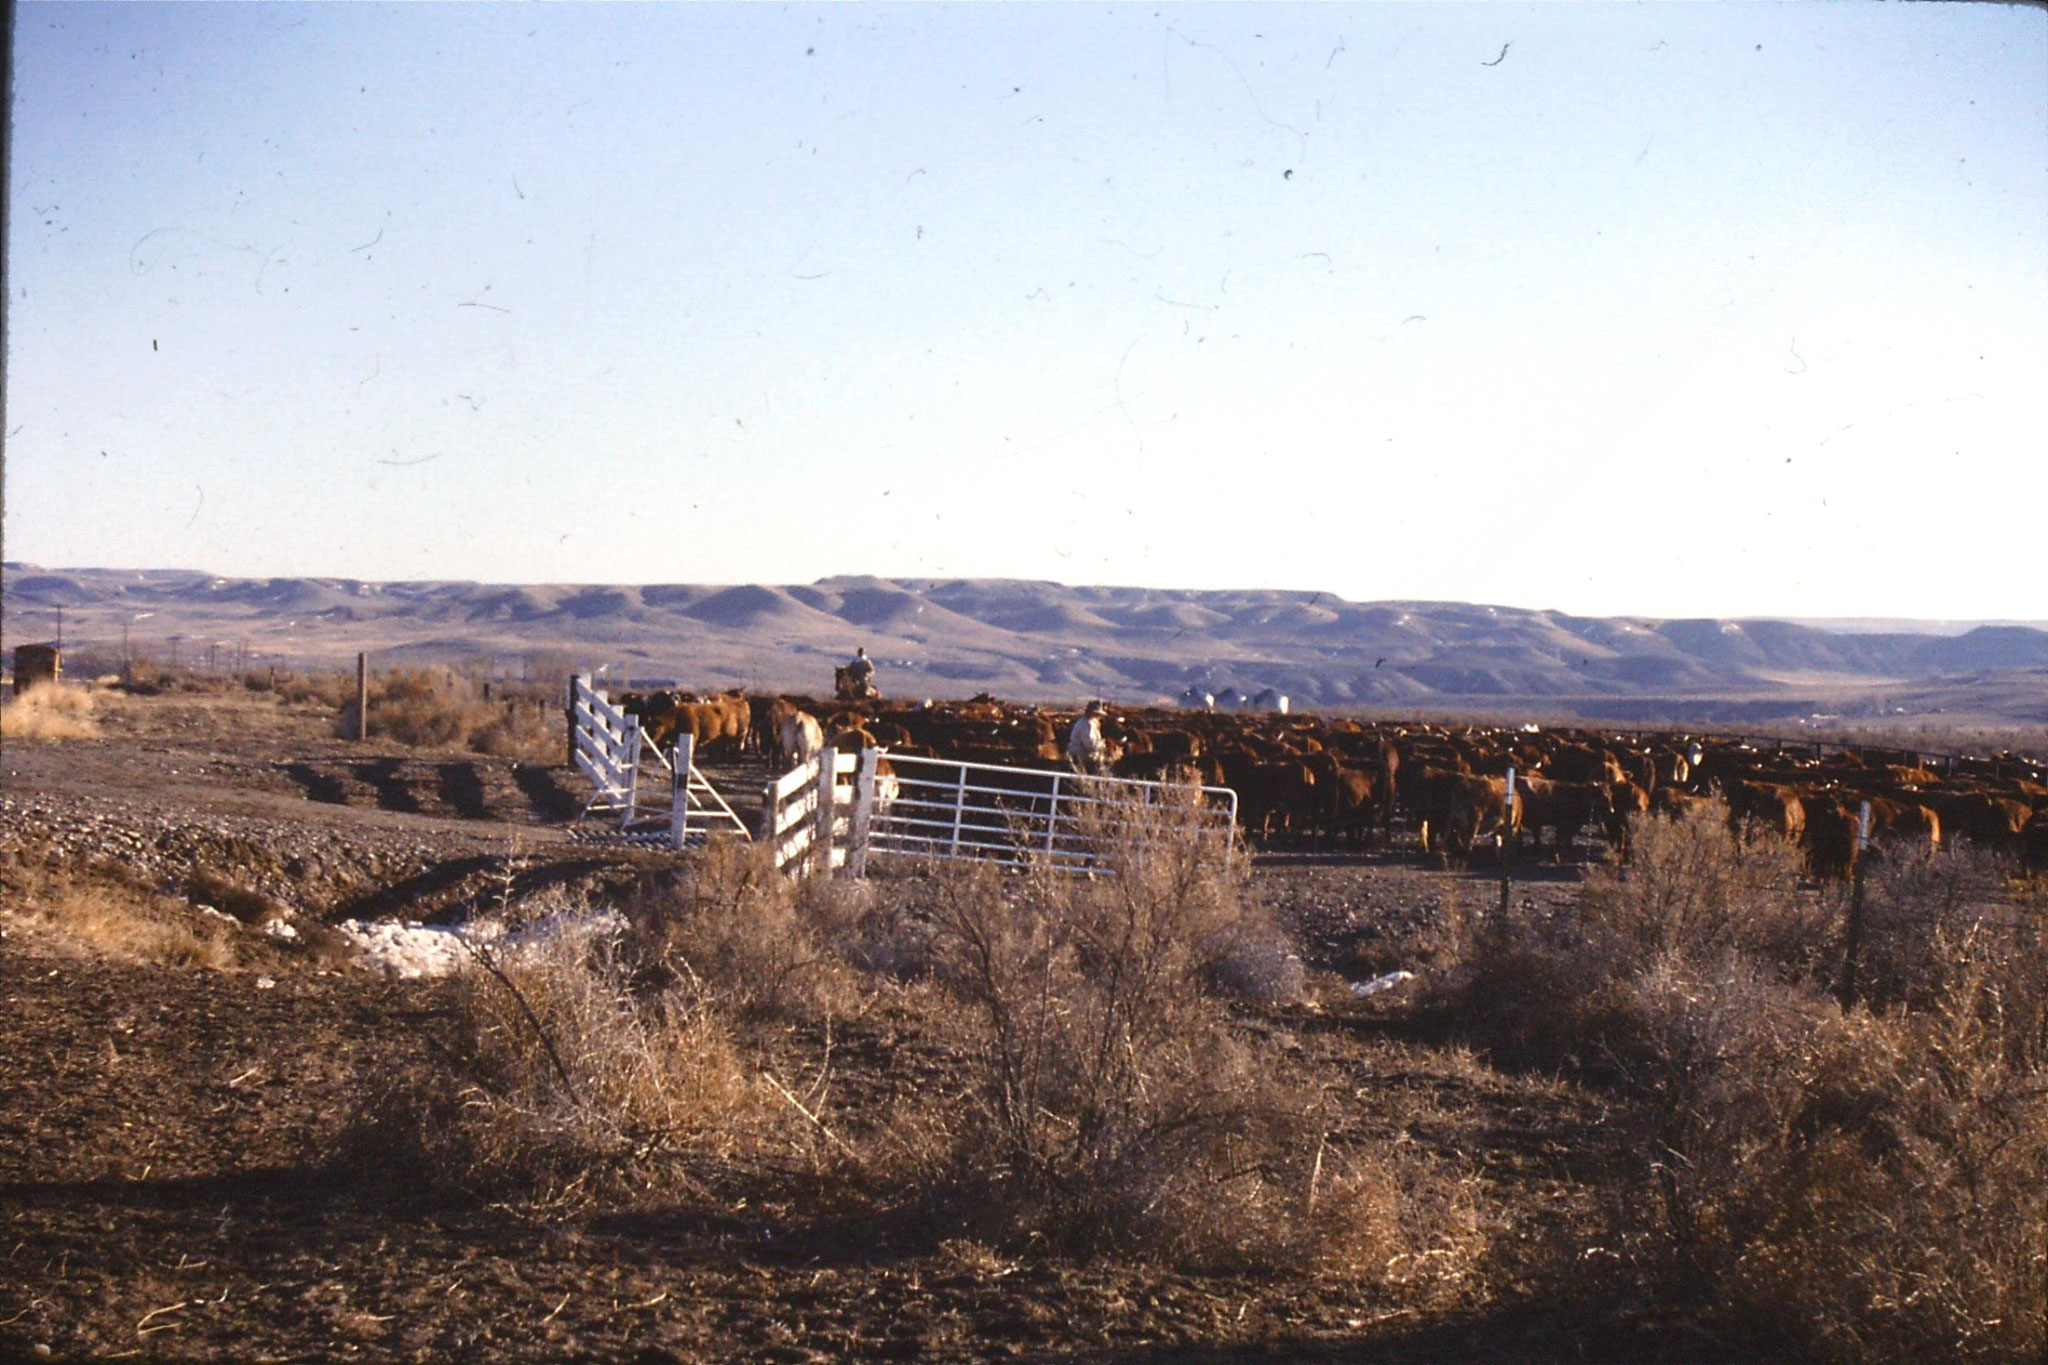 24/1/1991: 35: Bruneau Sand Dunes: cowboys